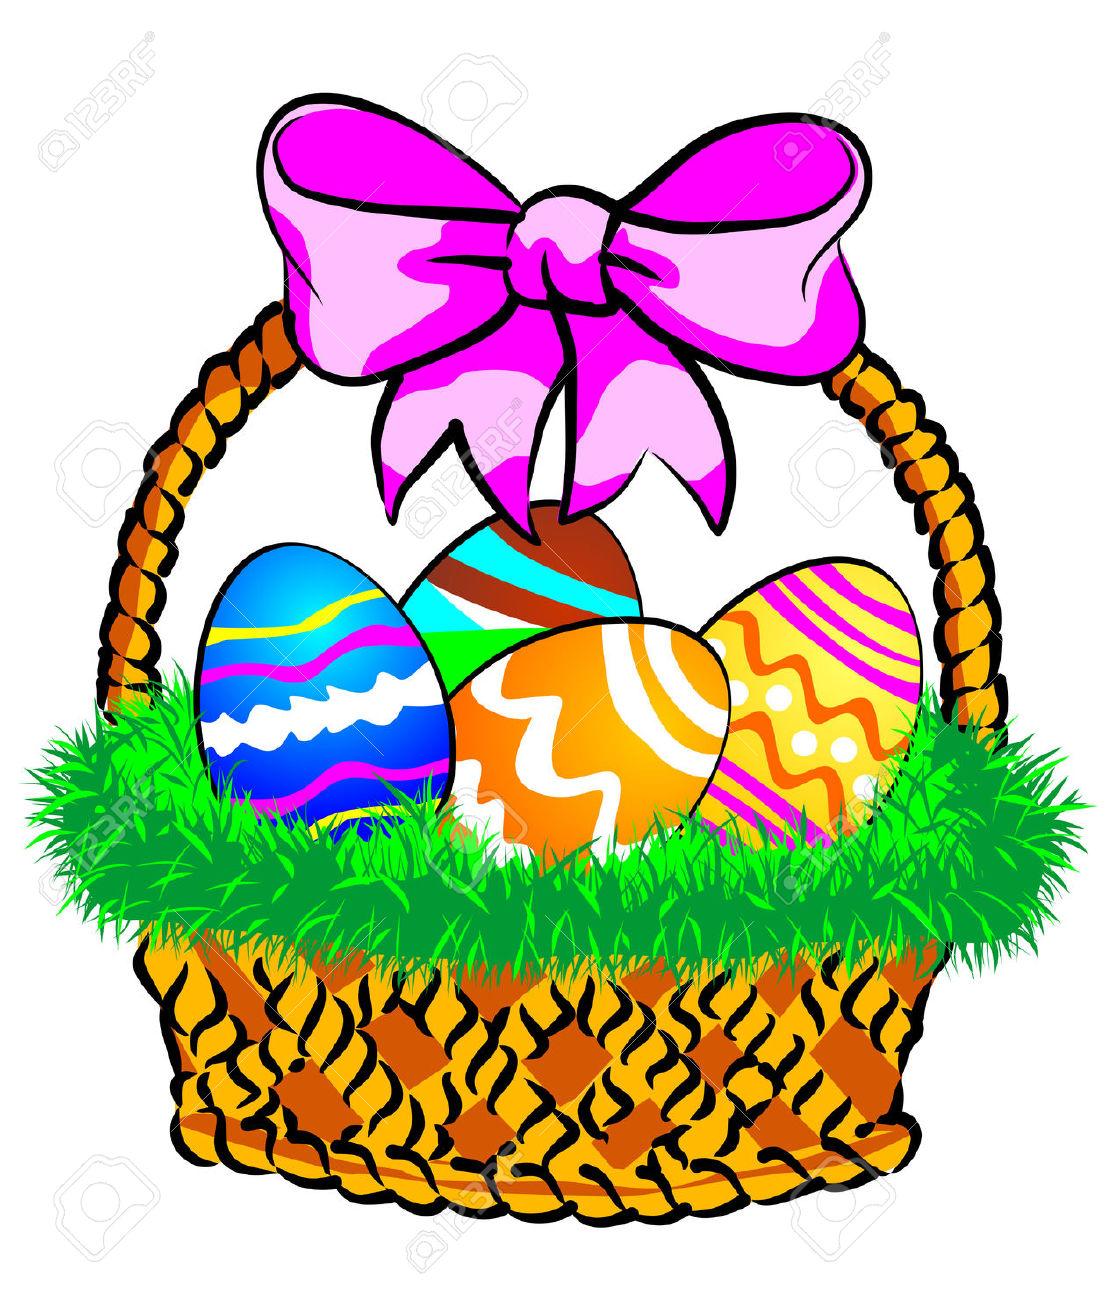 Easter basket clip art clip black and white library Easter basket grass clipart - ClipartFest clip black and white library